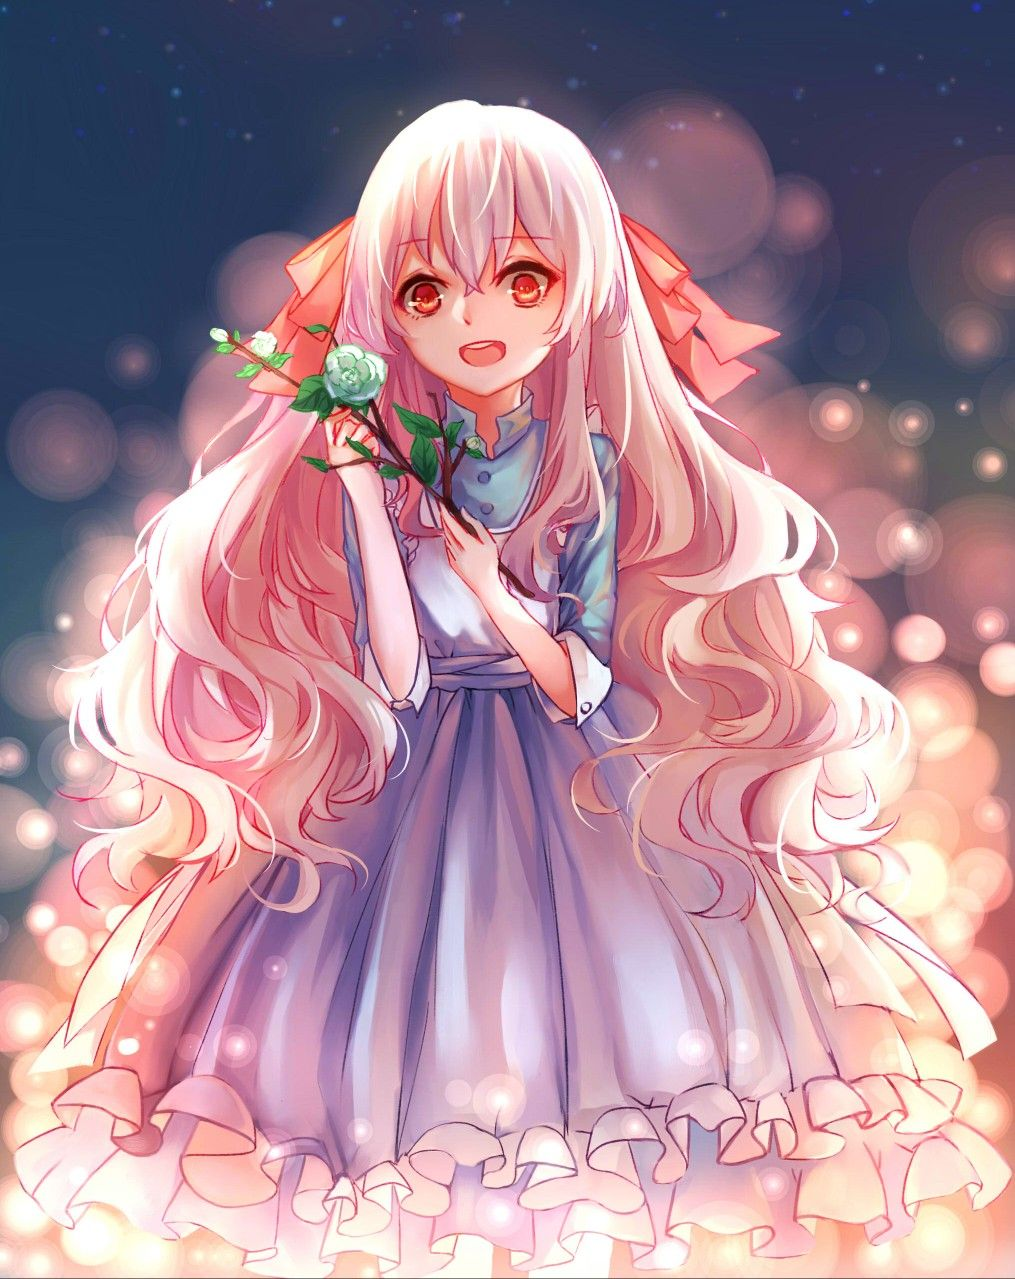 Cute Kawaii Anime Wallpaper : kawaii, anime, wallpaper, Kawaii, Anime, Wallpapers, Backgrounds, WallpaperAccess